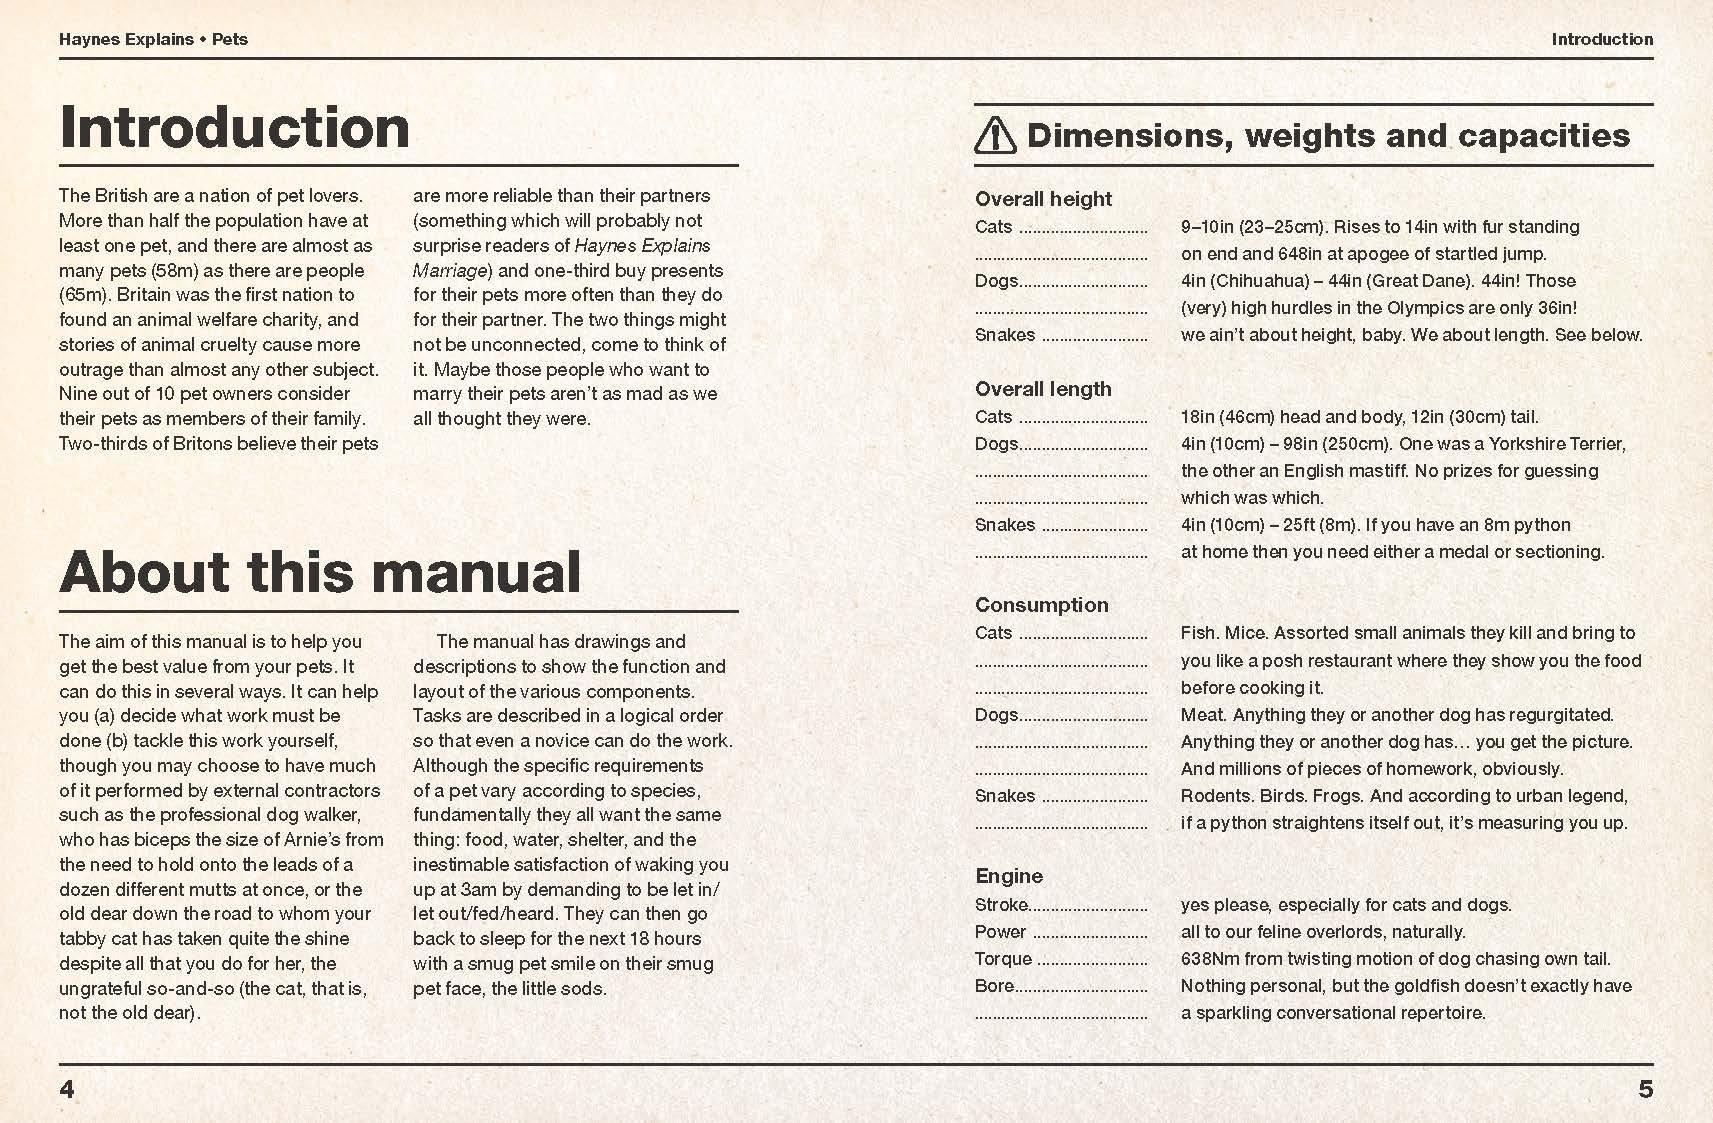 Pets Haynes Explains Manuals Boris Reading Wiring Diagram Starling 9781785211539 Books